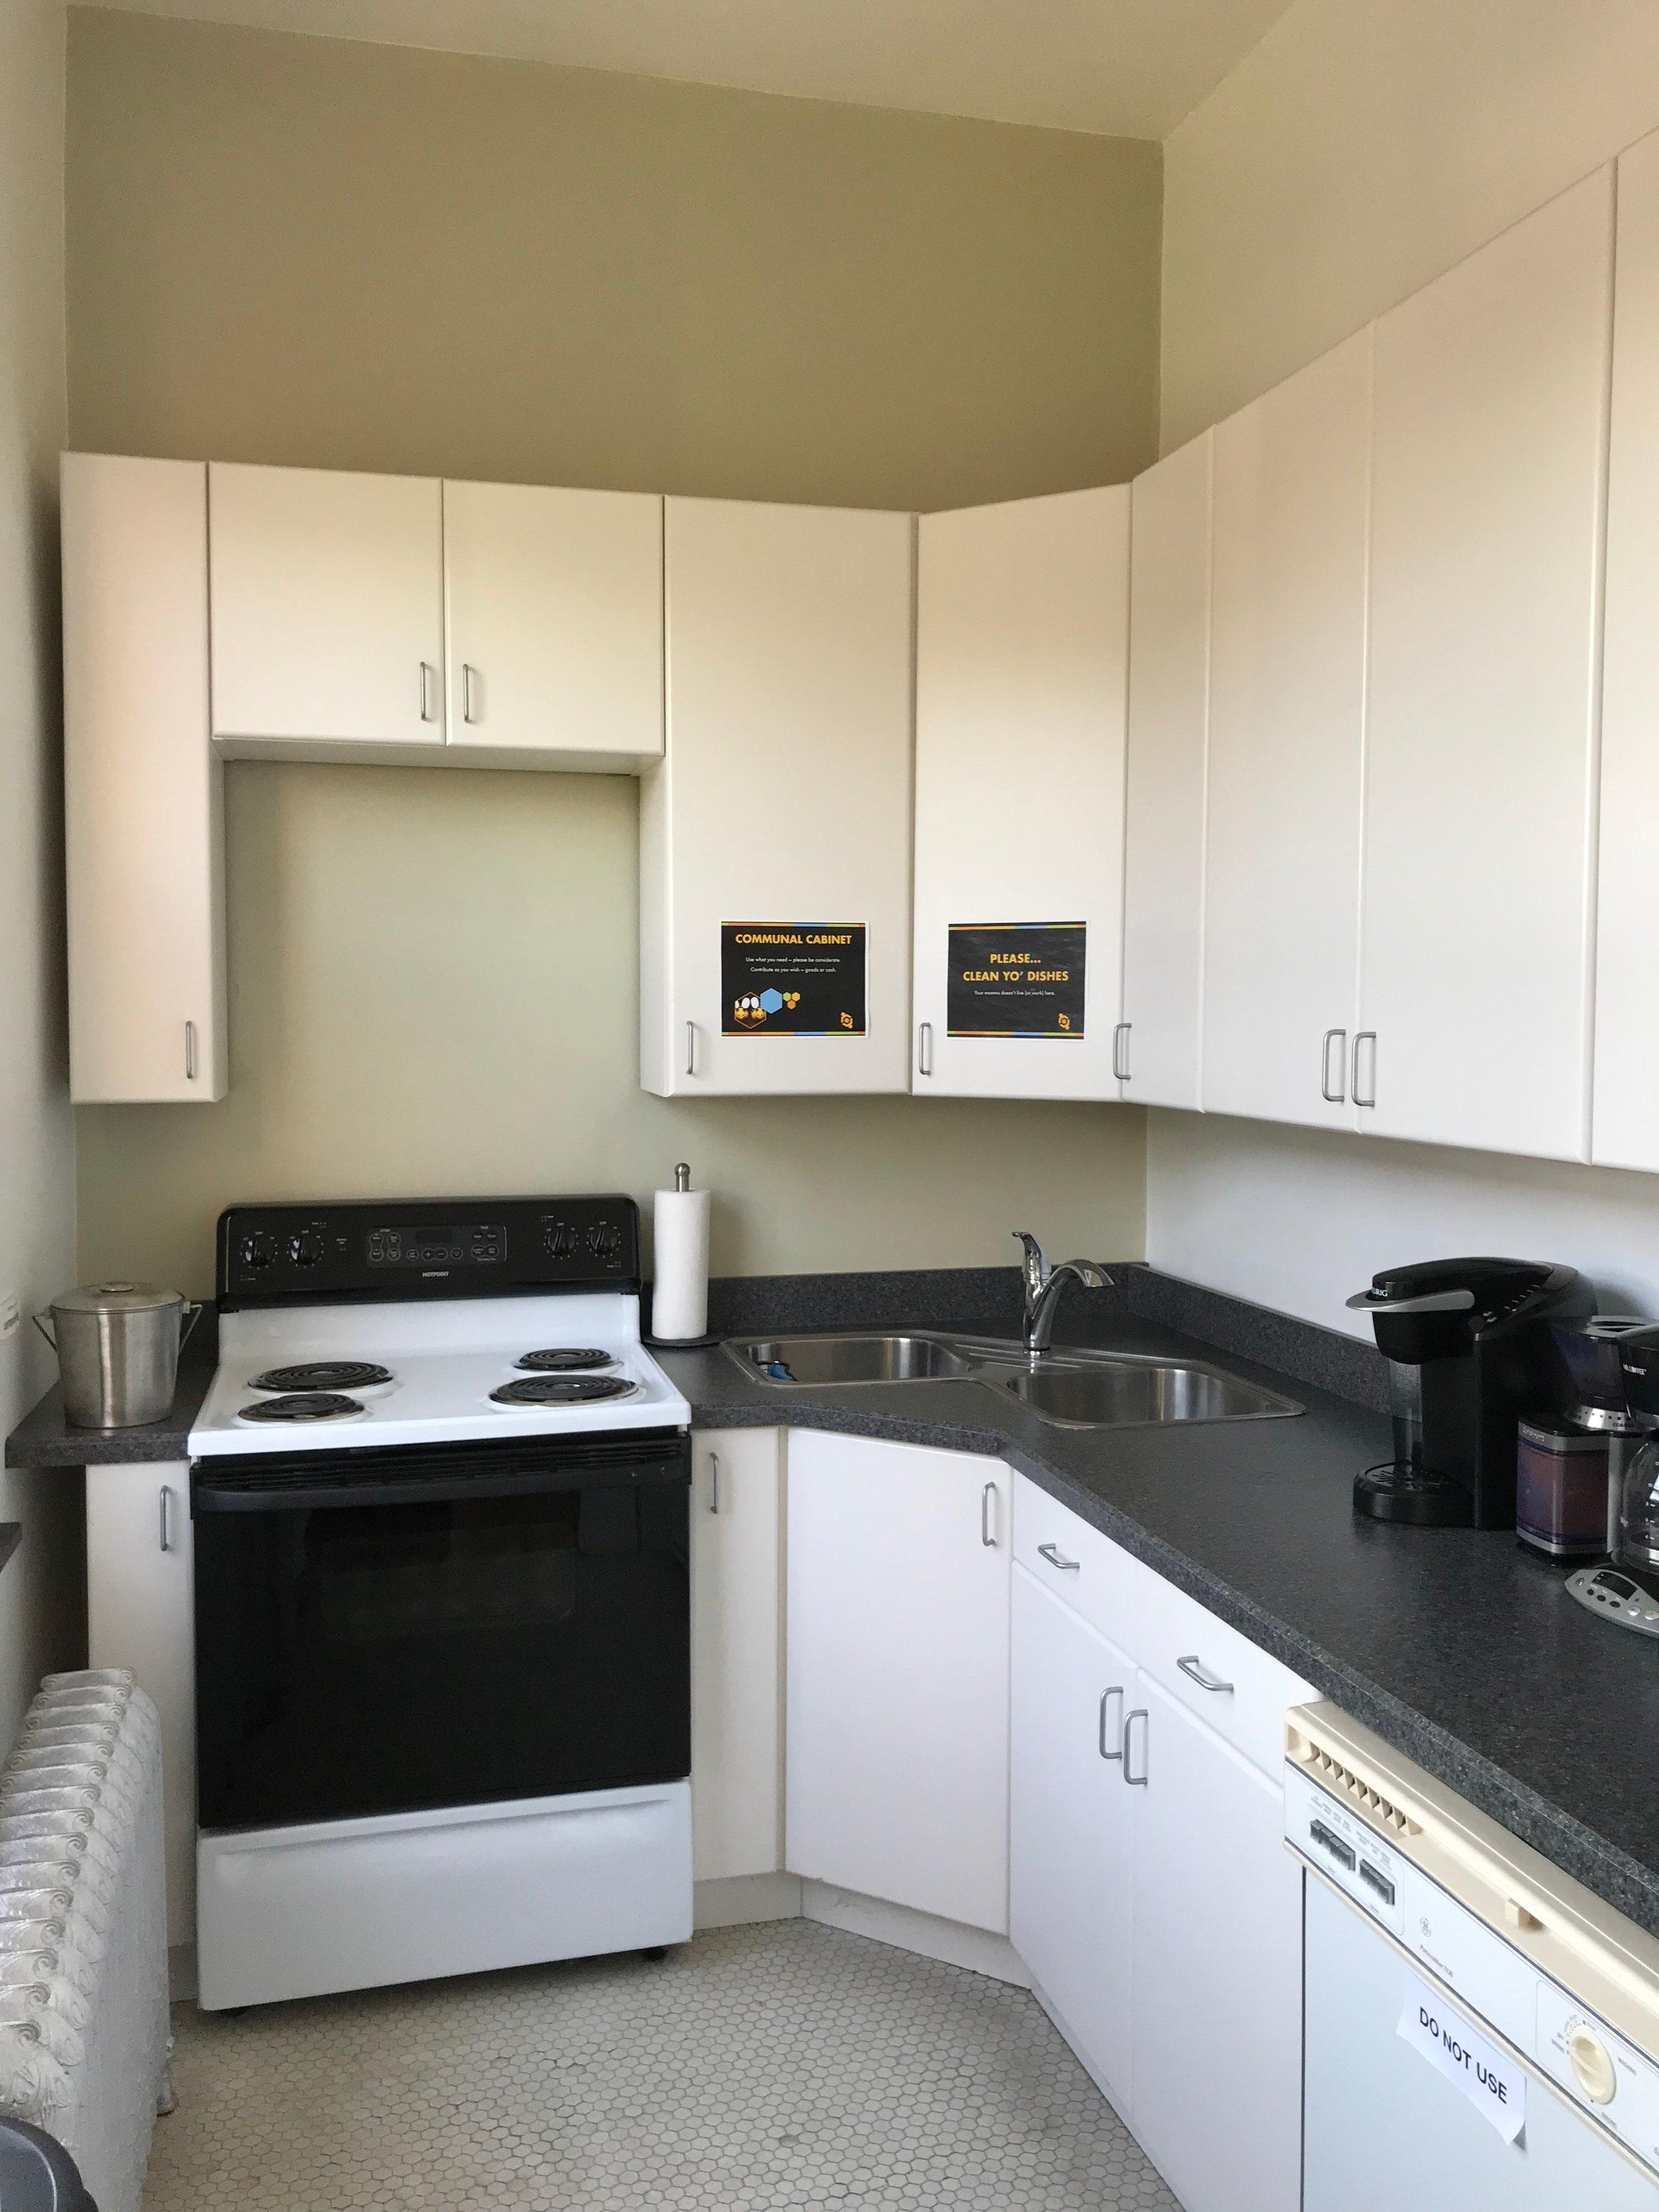 telelphone  building kitchen.jpg